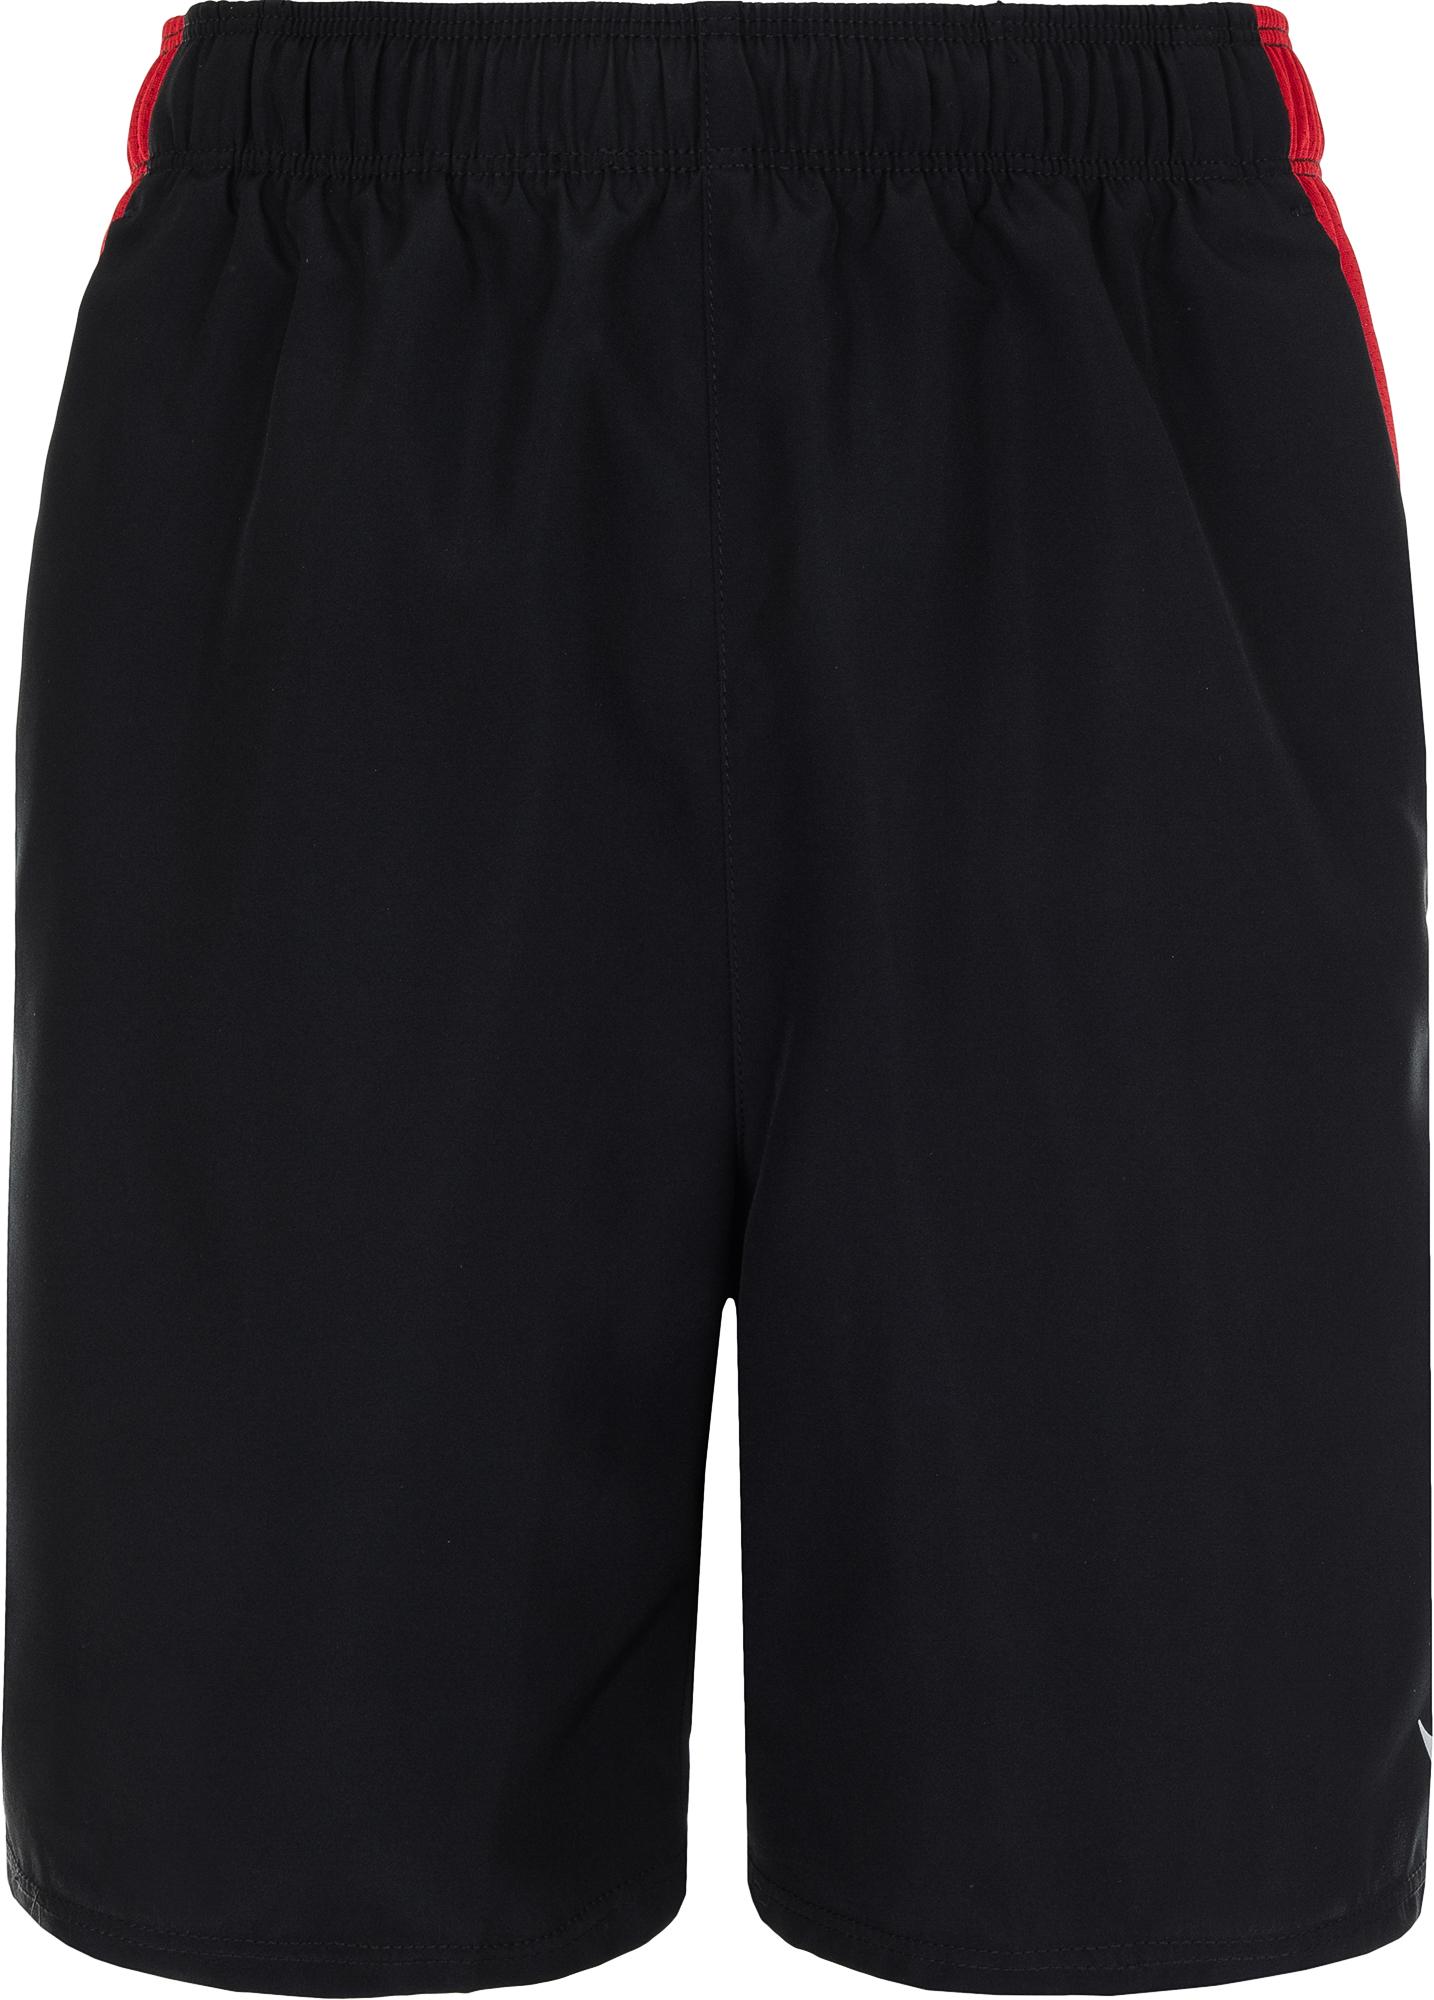 Nike Шорты для мальчиков Nike Flex Challenger, размер 158-170 цены онлайн